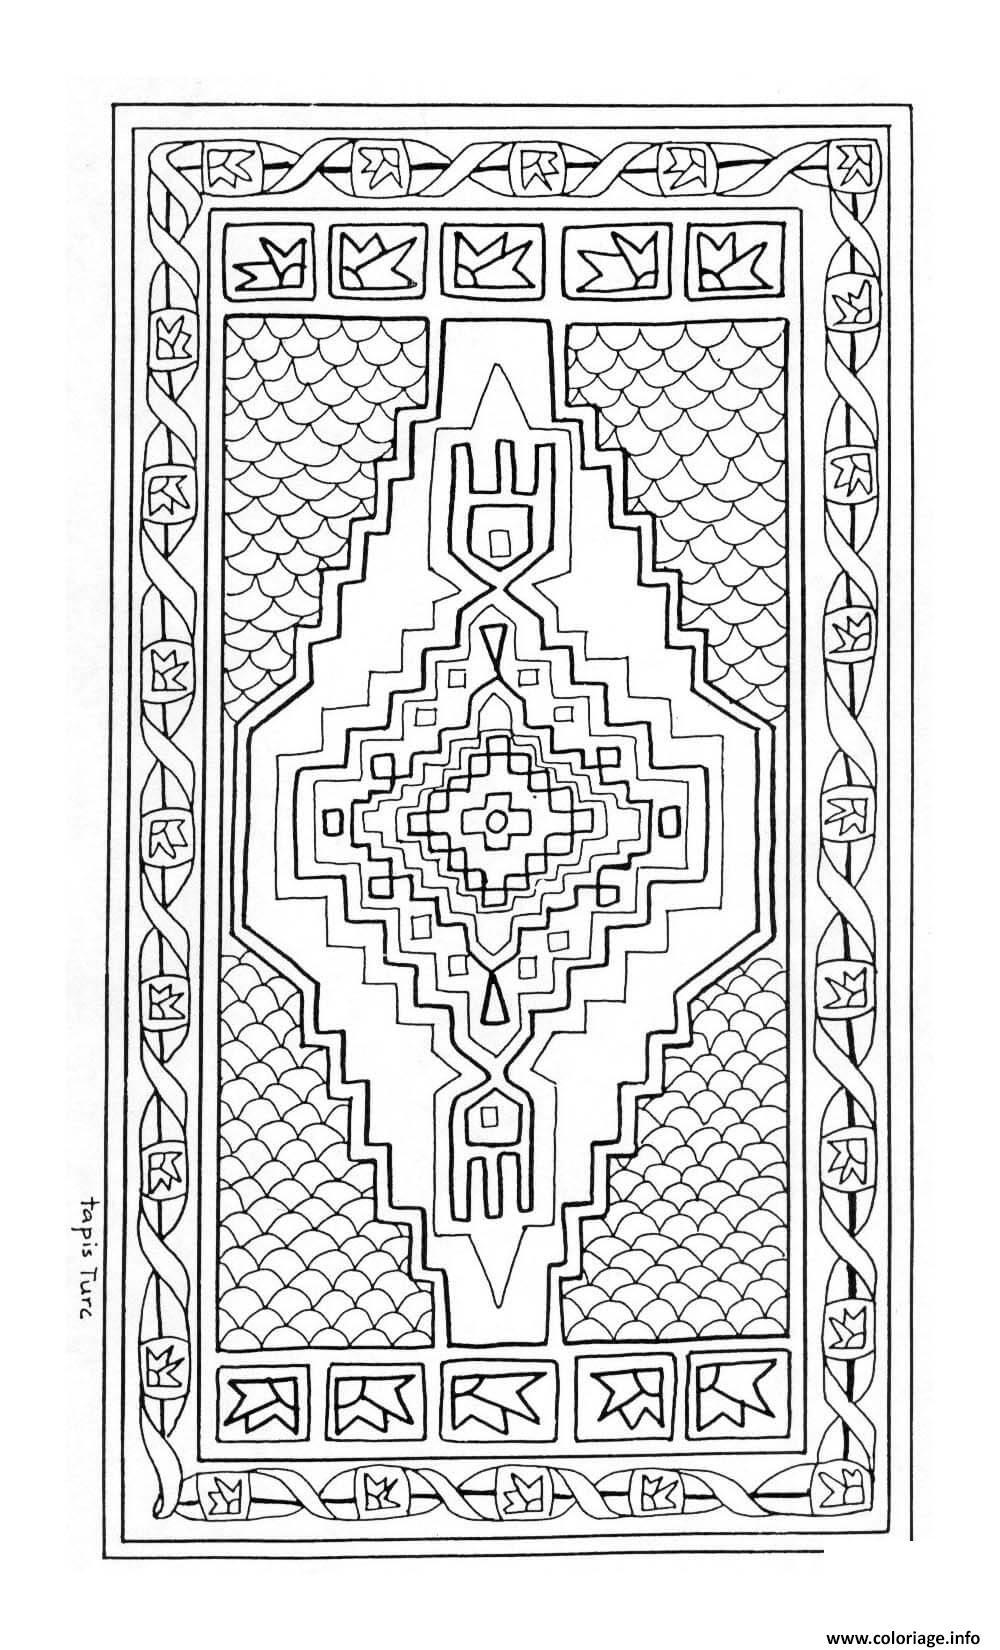 Coloriage Mandala Tapis Turc Joeke Remkus De Vries Dessin